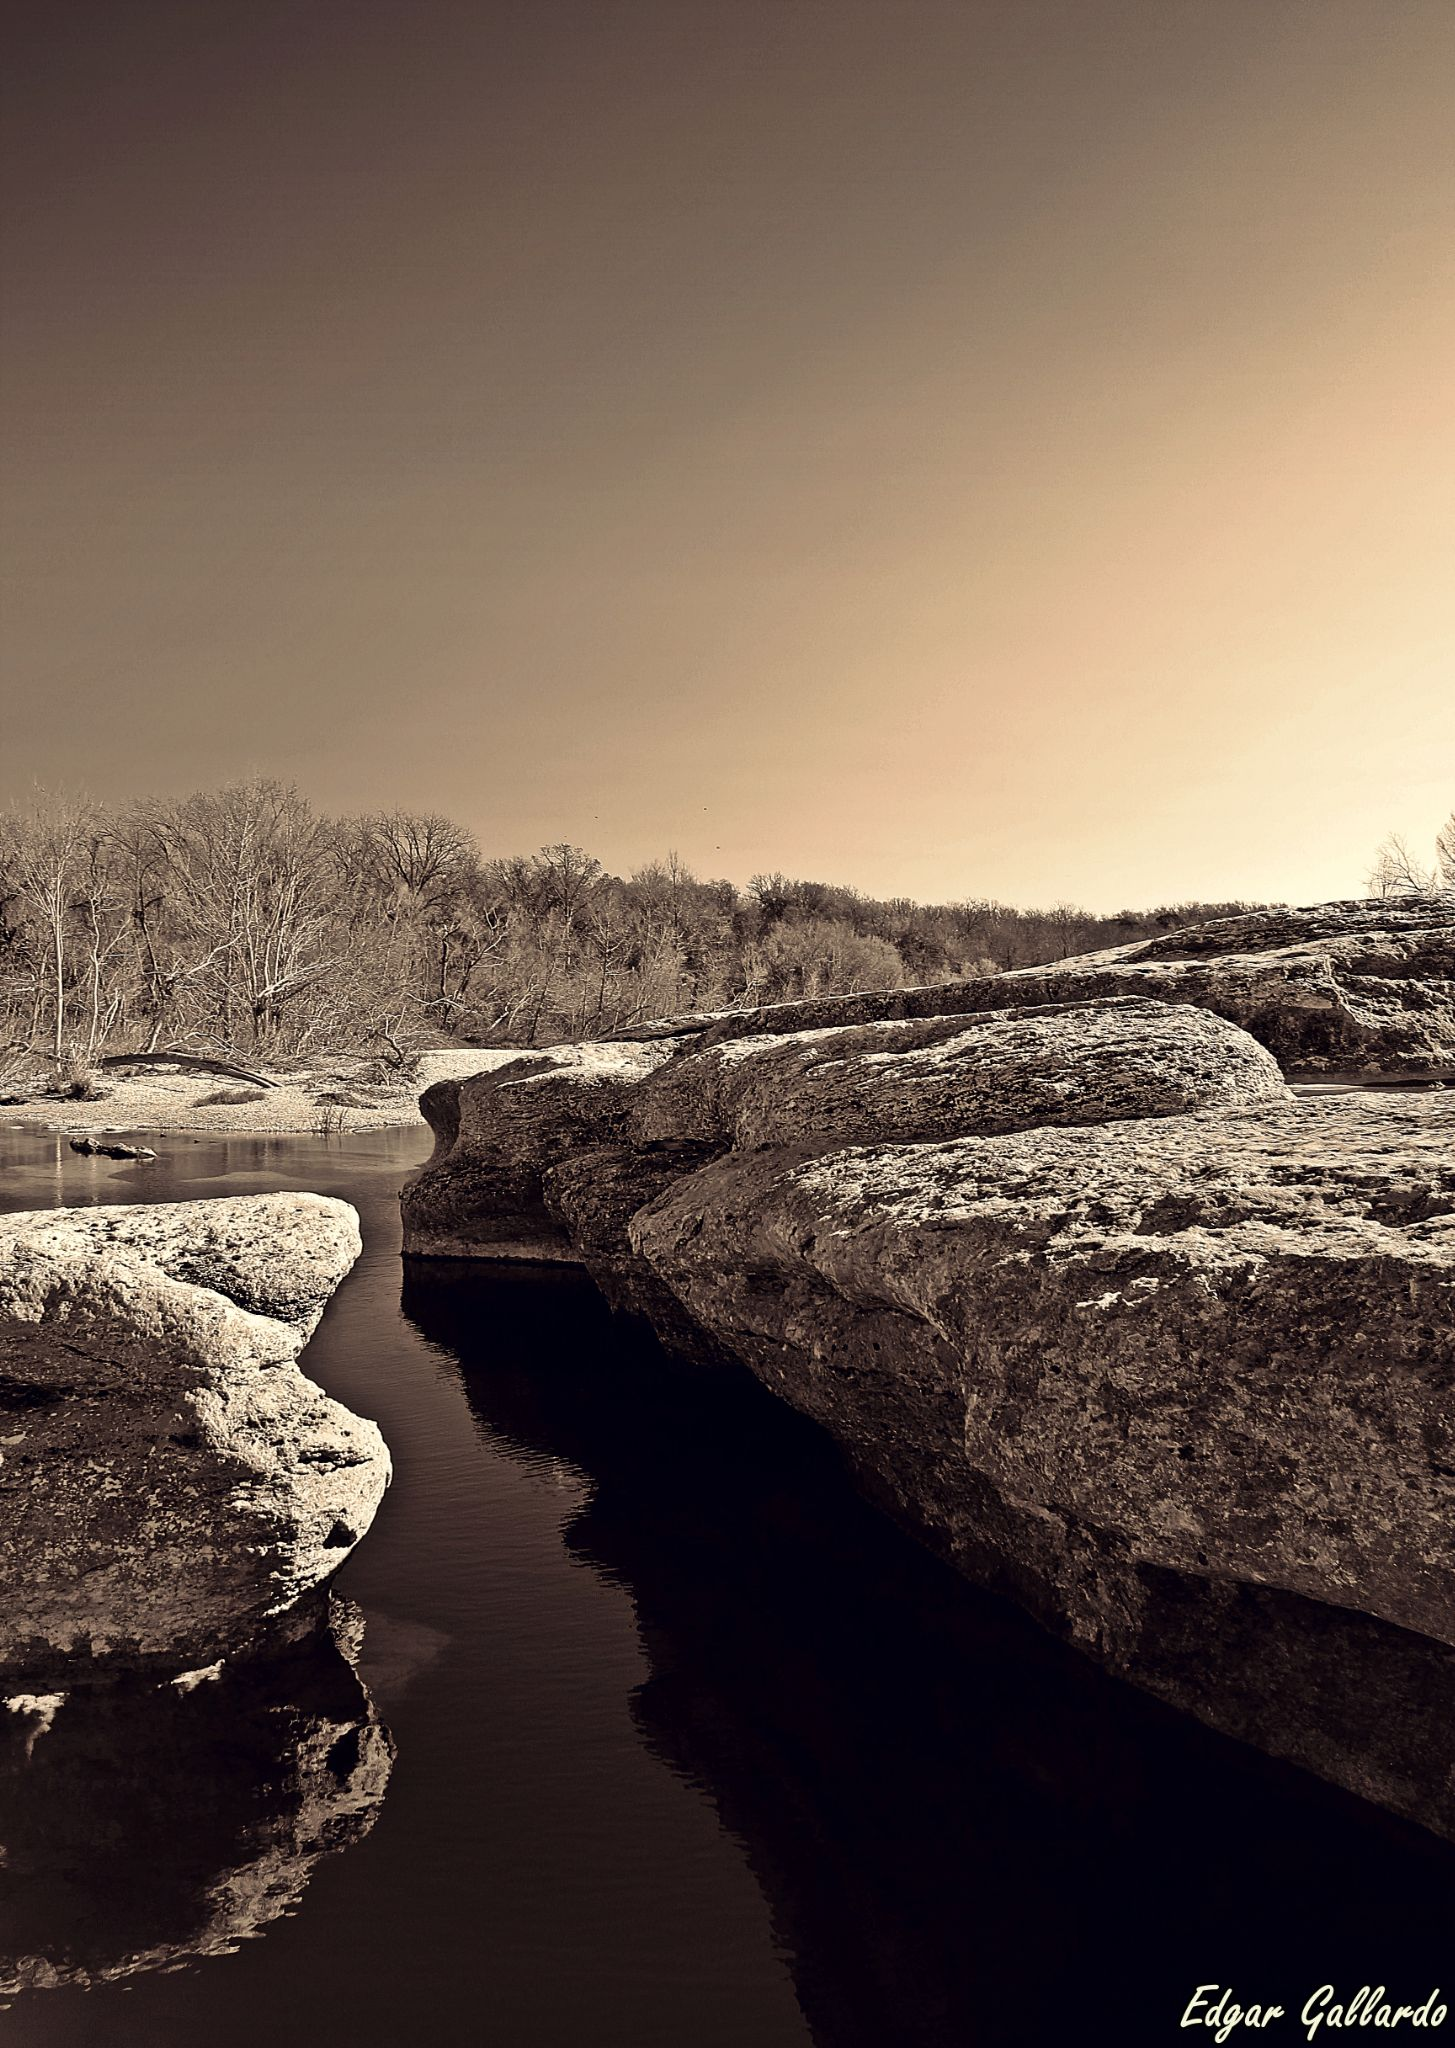 Reflection By: www.edgargallardophotography.com by Edgar Gallardo Photography (Raw Nature)